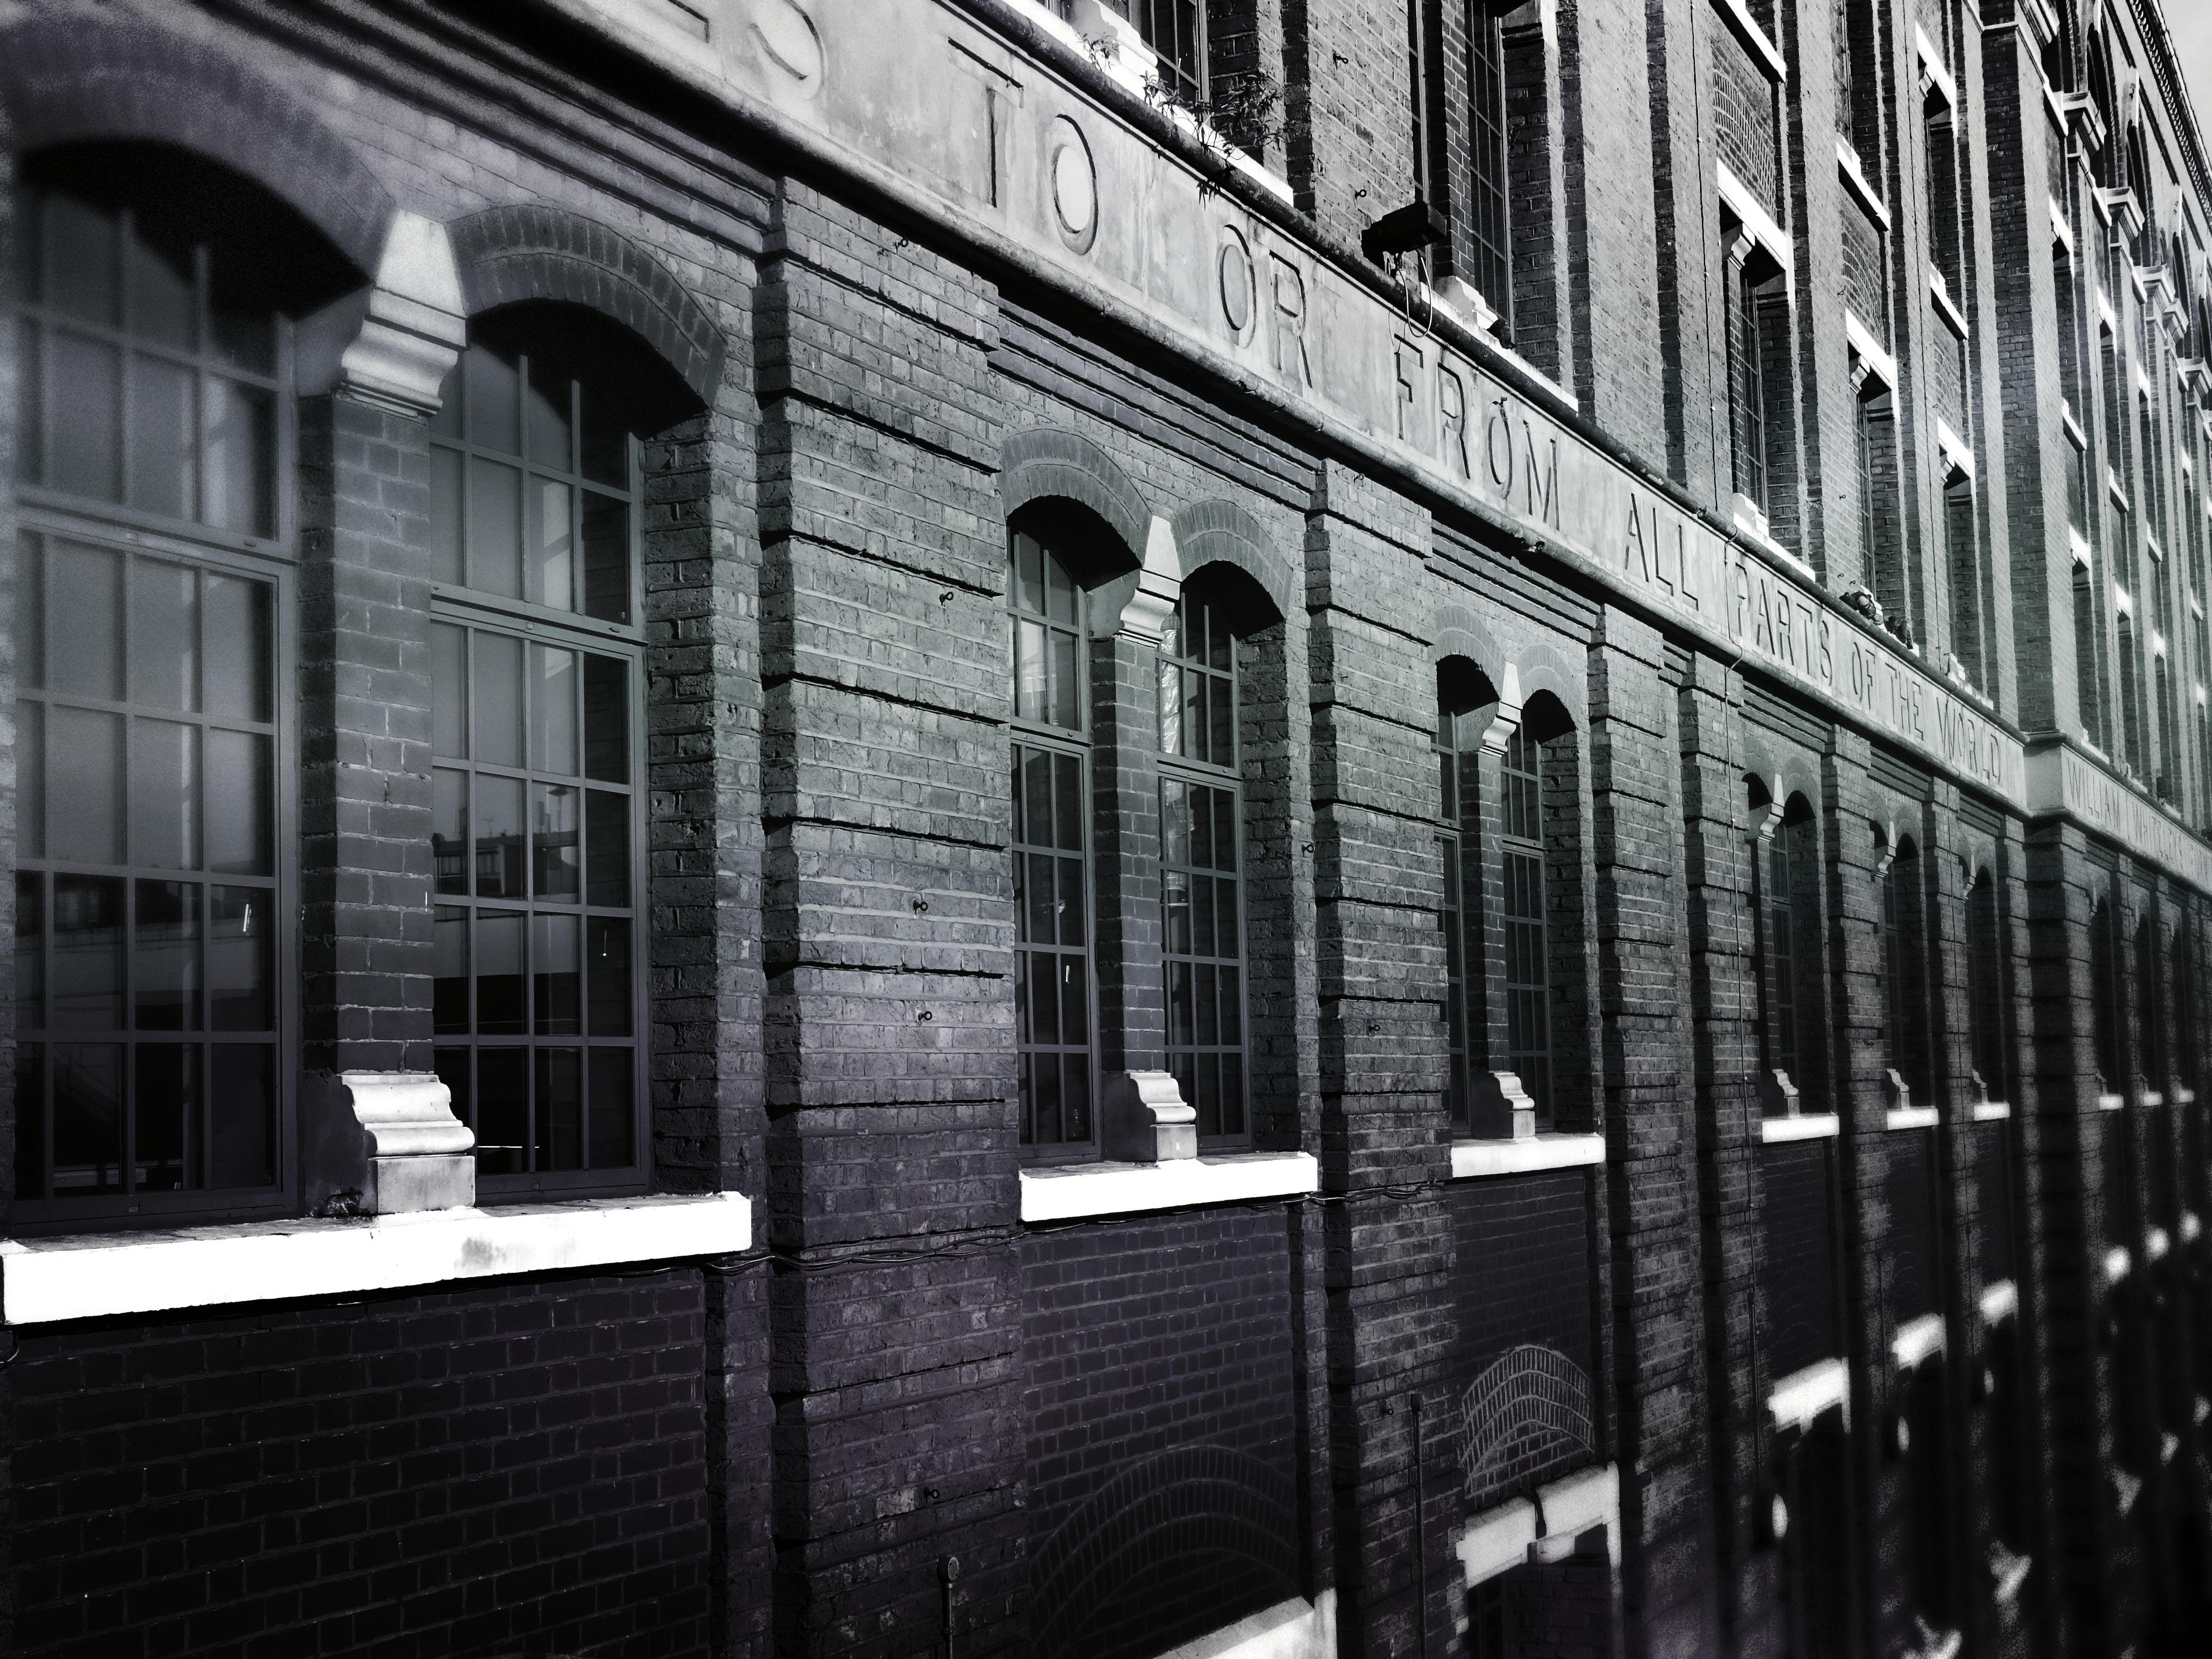 architecture, black and white, bricks